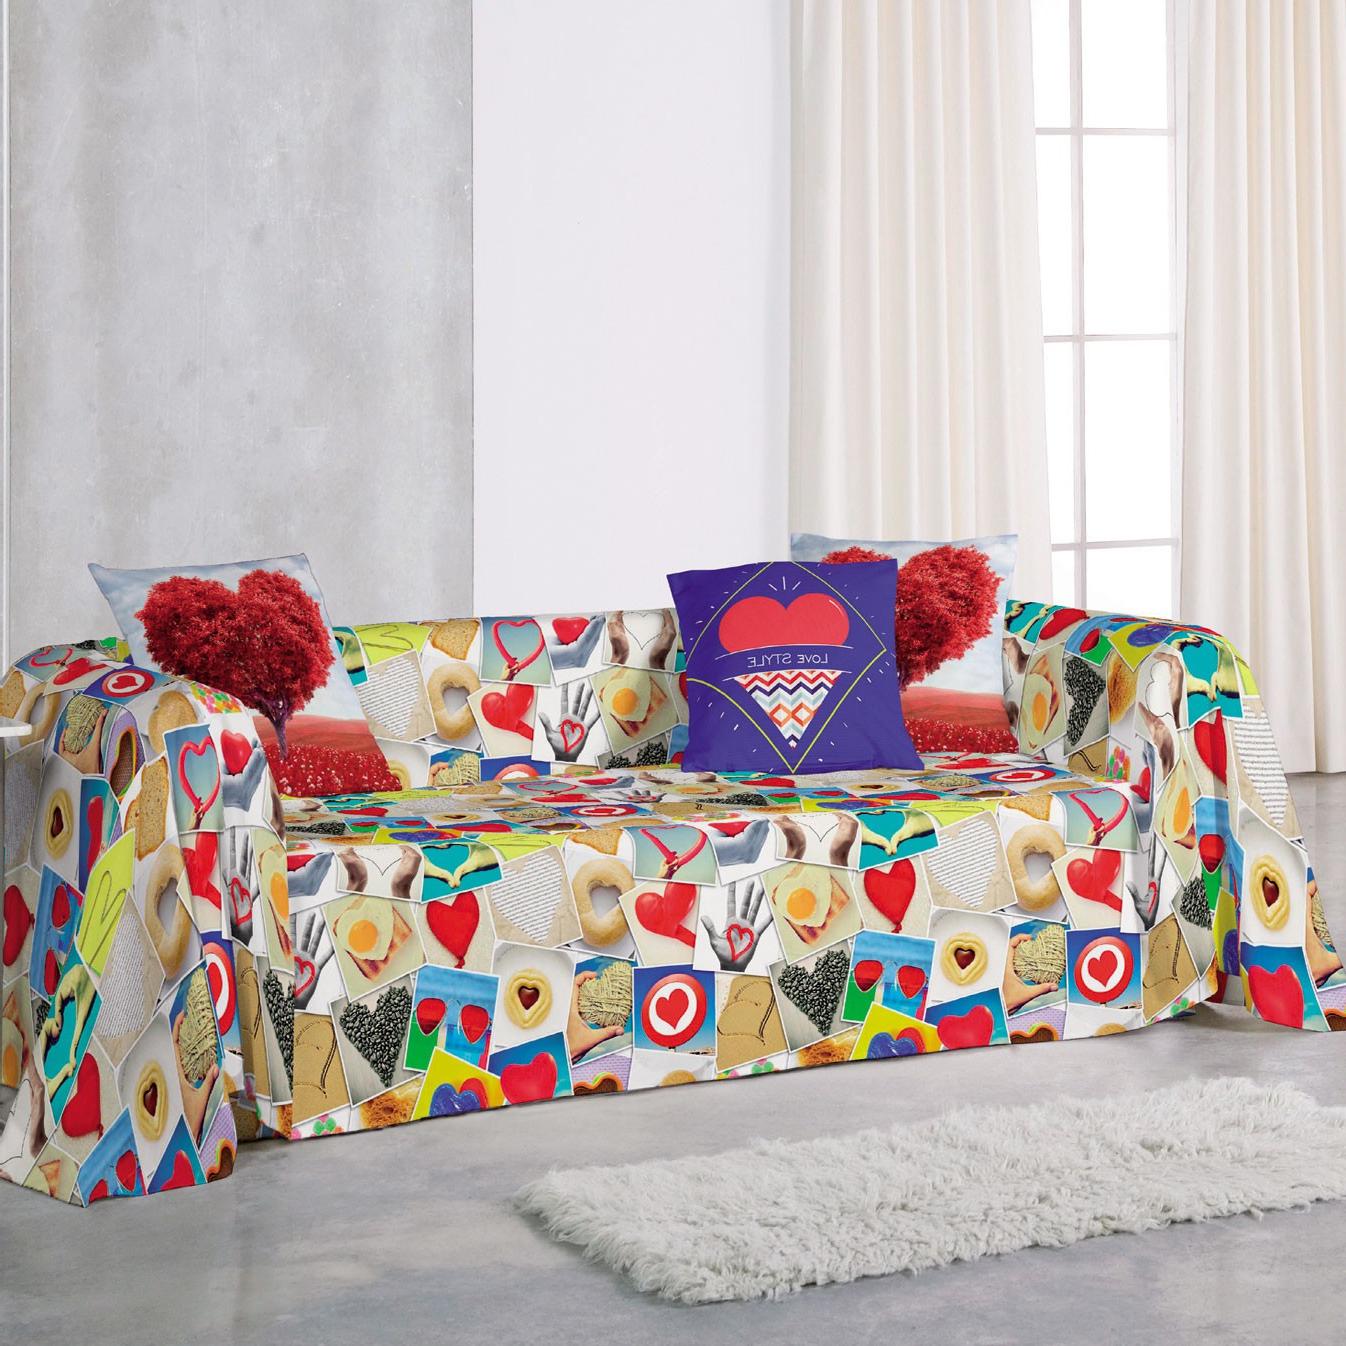 Foulard Cubre sofa Tldn Foulard Love